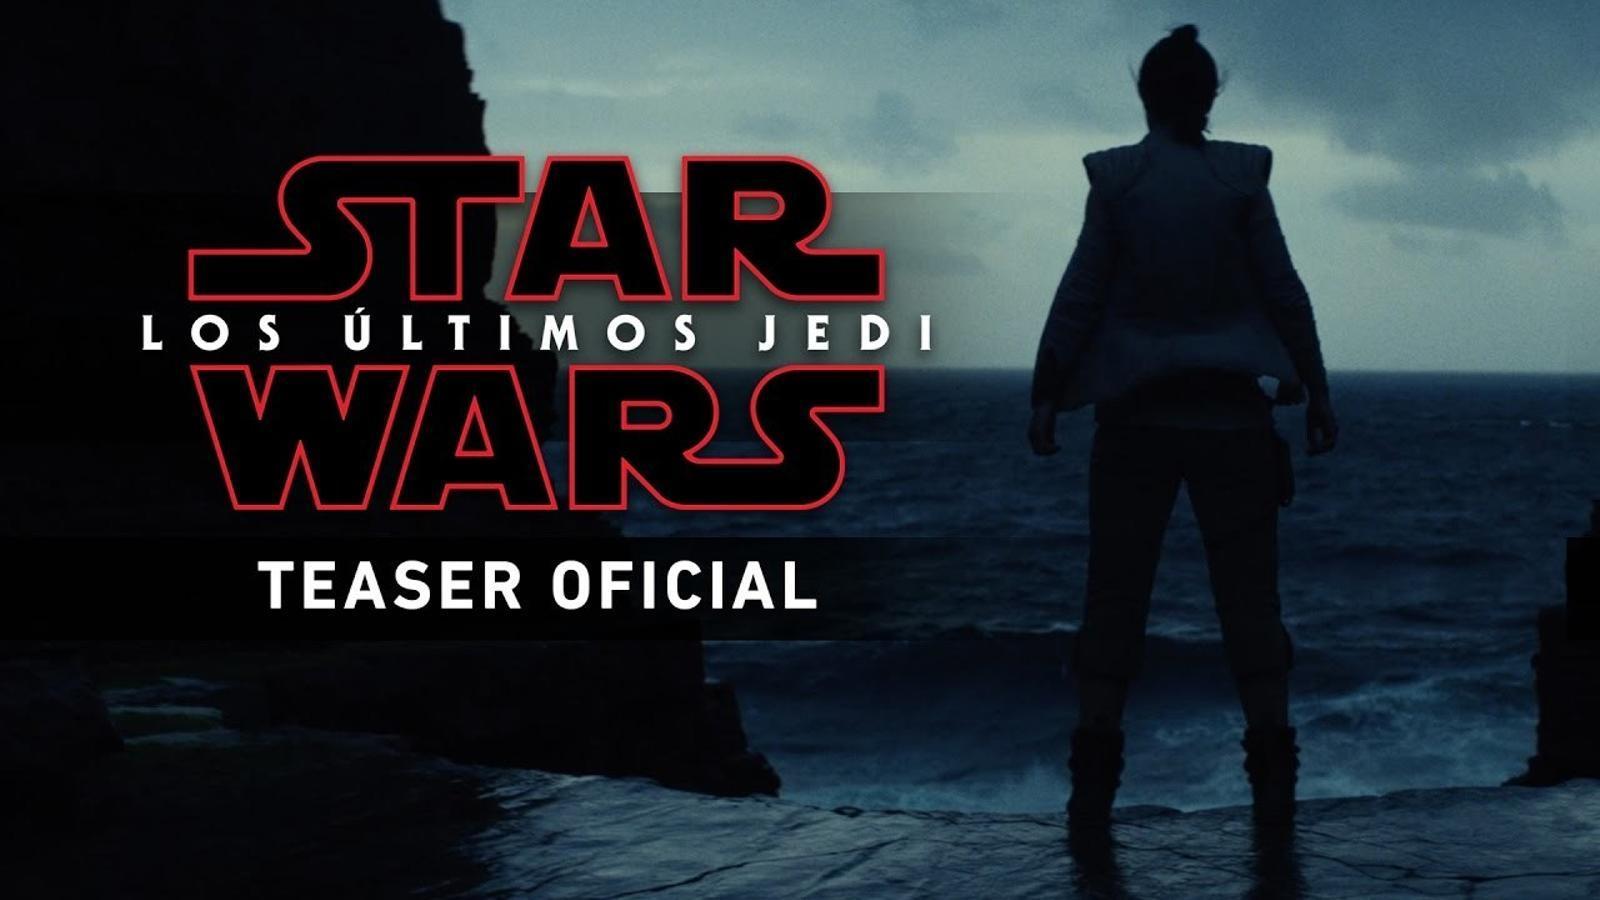 Surt el primer tràiler de 'Star Wars: L'últim Jedi'